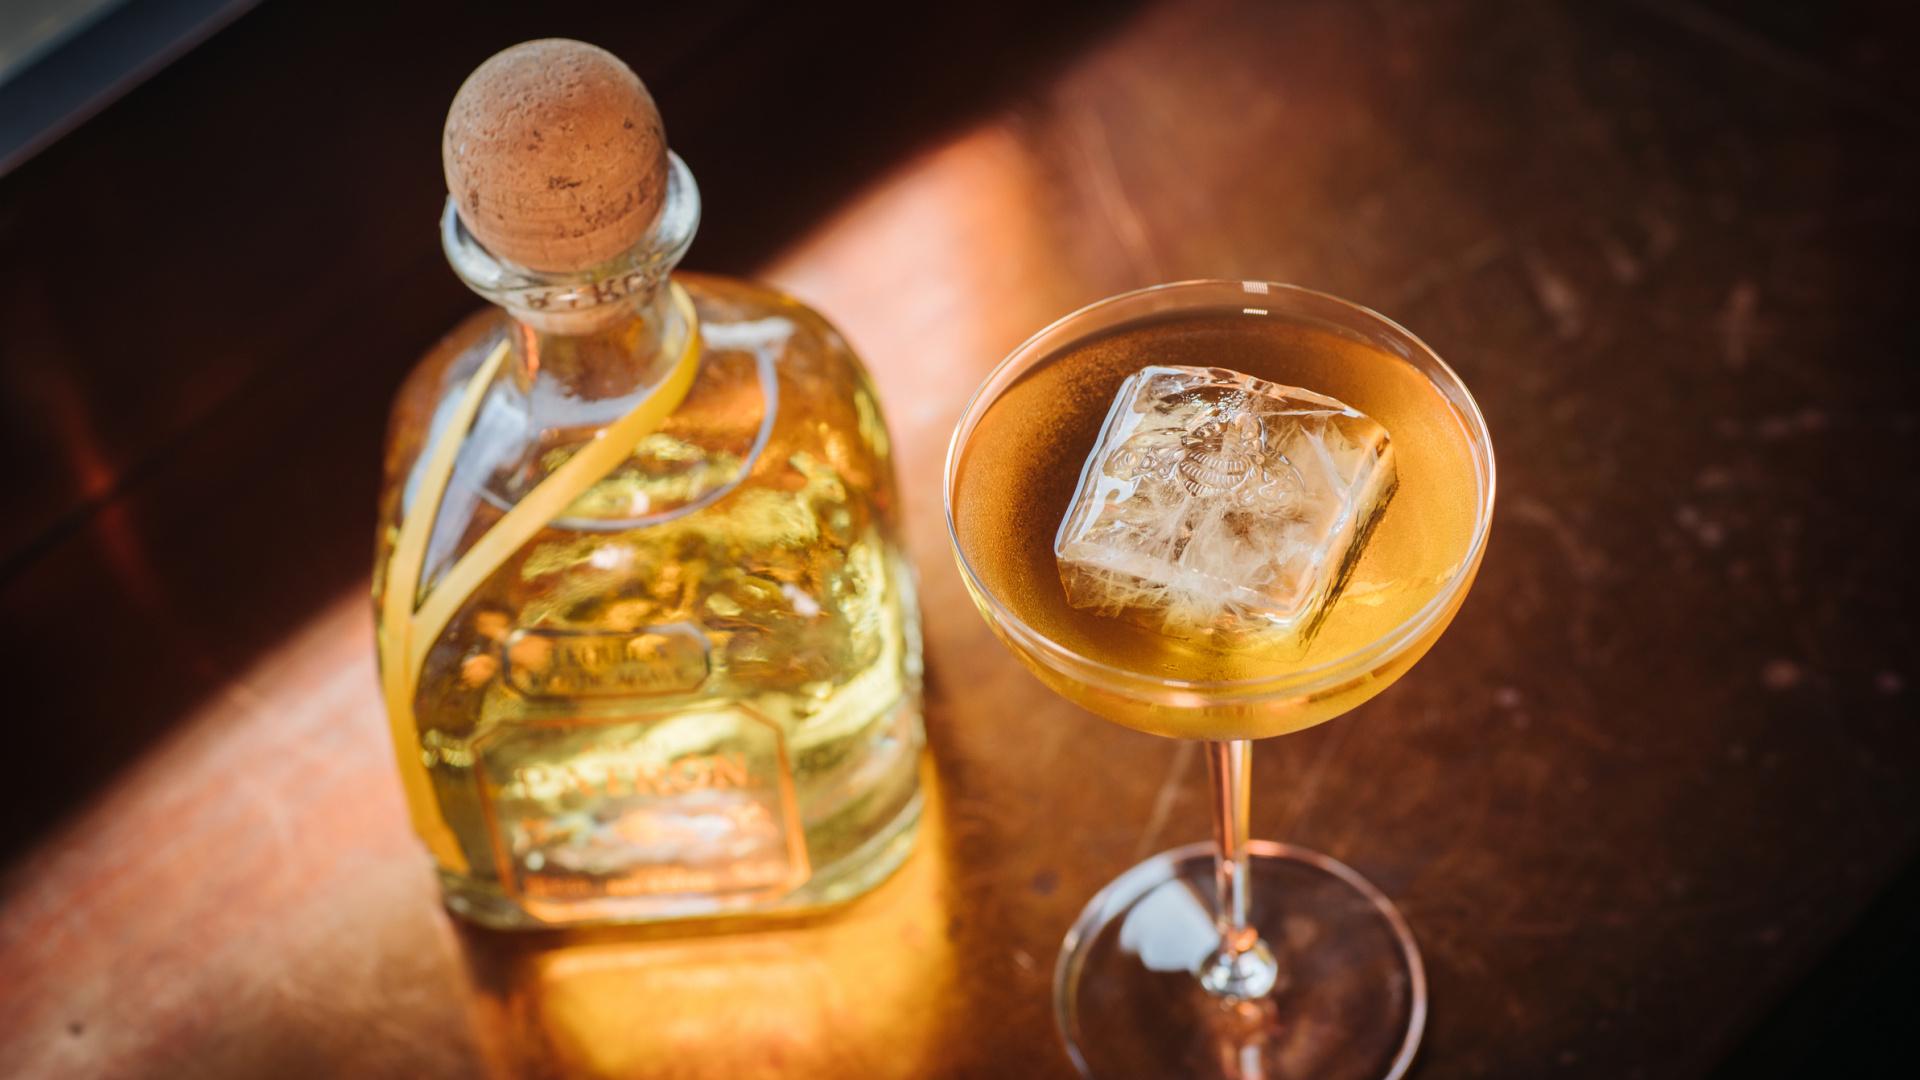 Make Patrón's Salt of the Earth cocktail